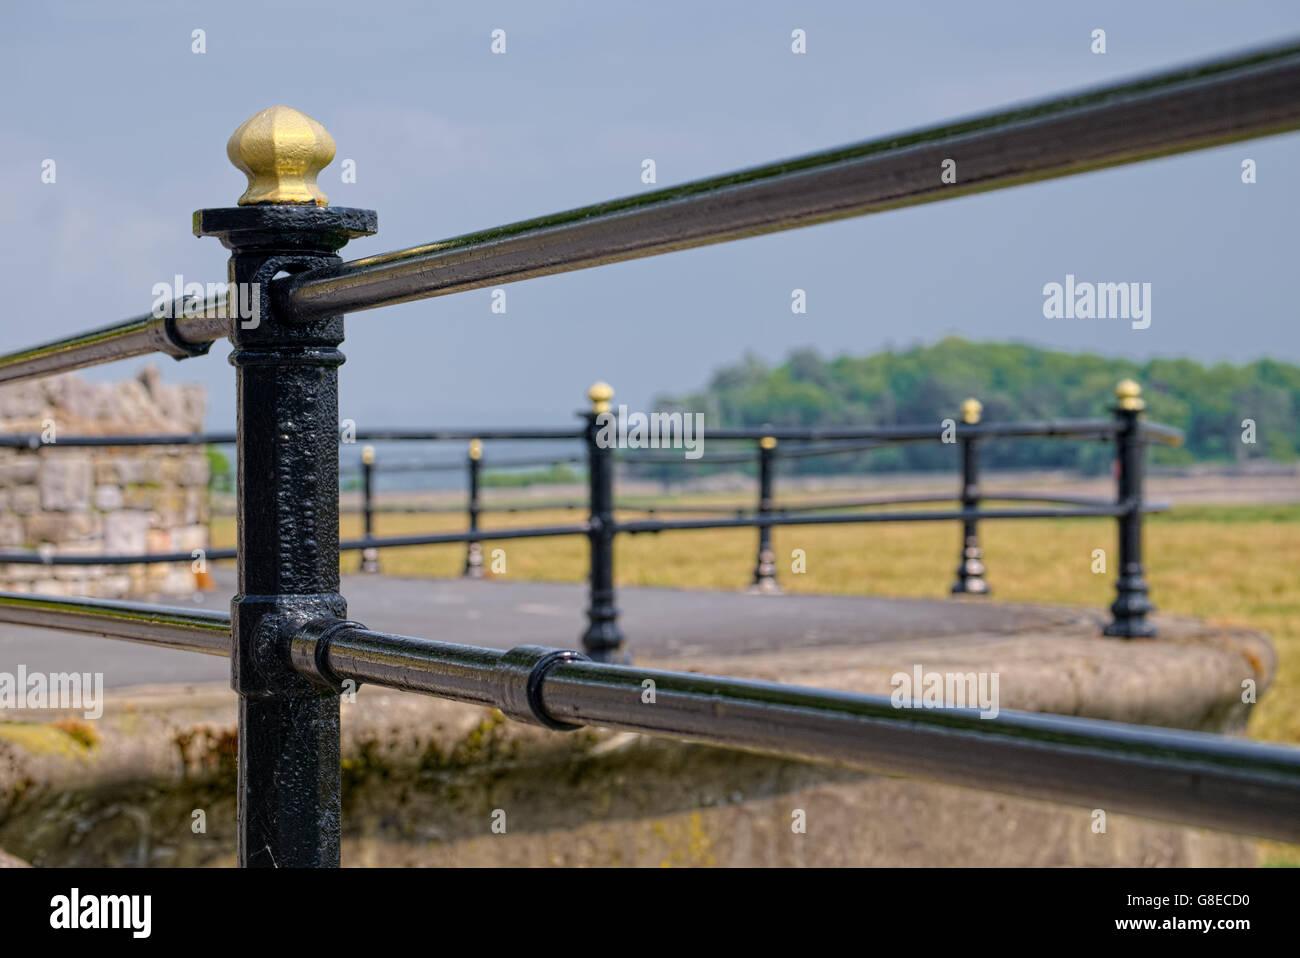 Cast Iron Railings - Stock Image